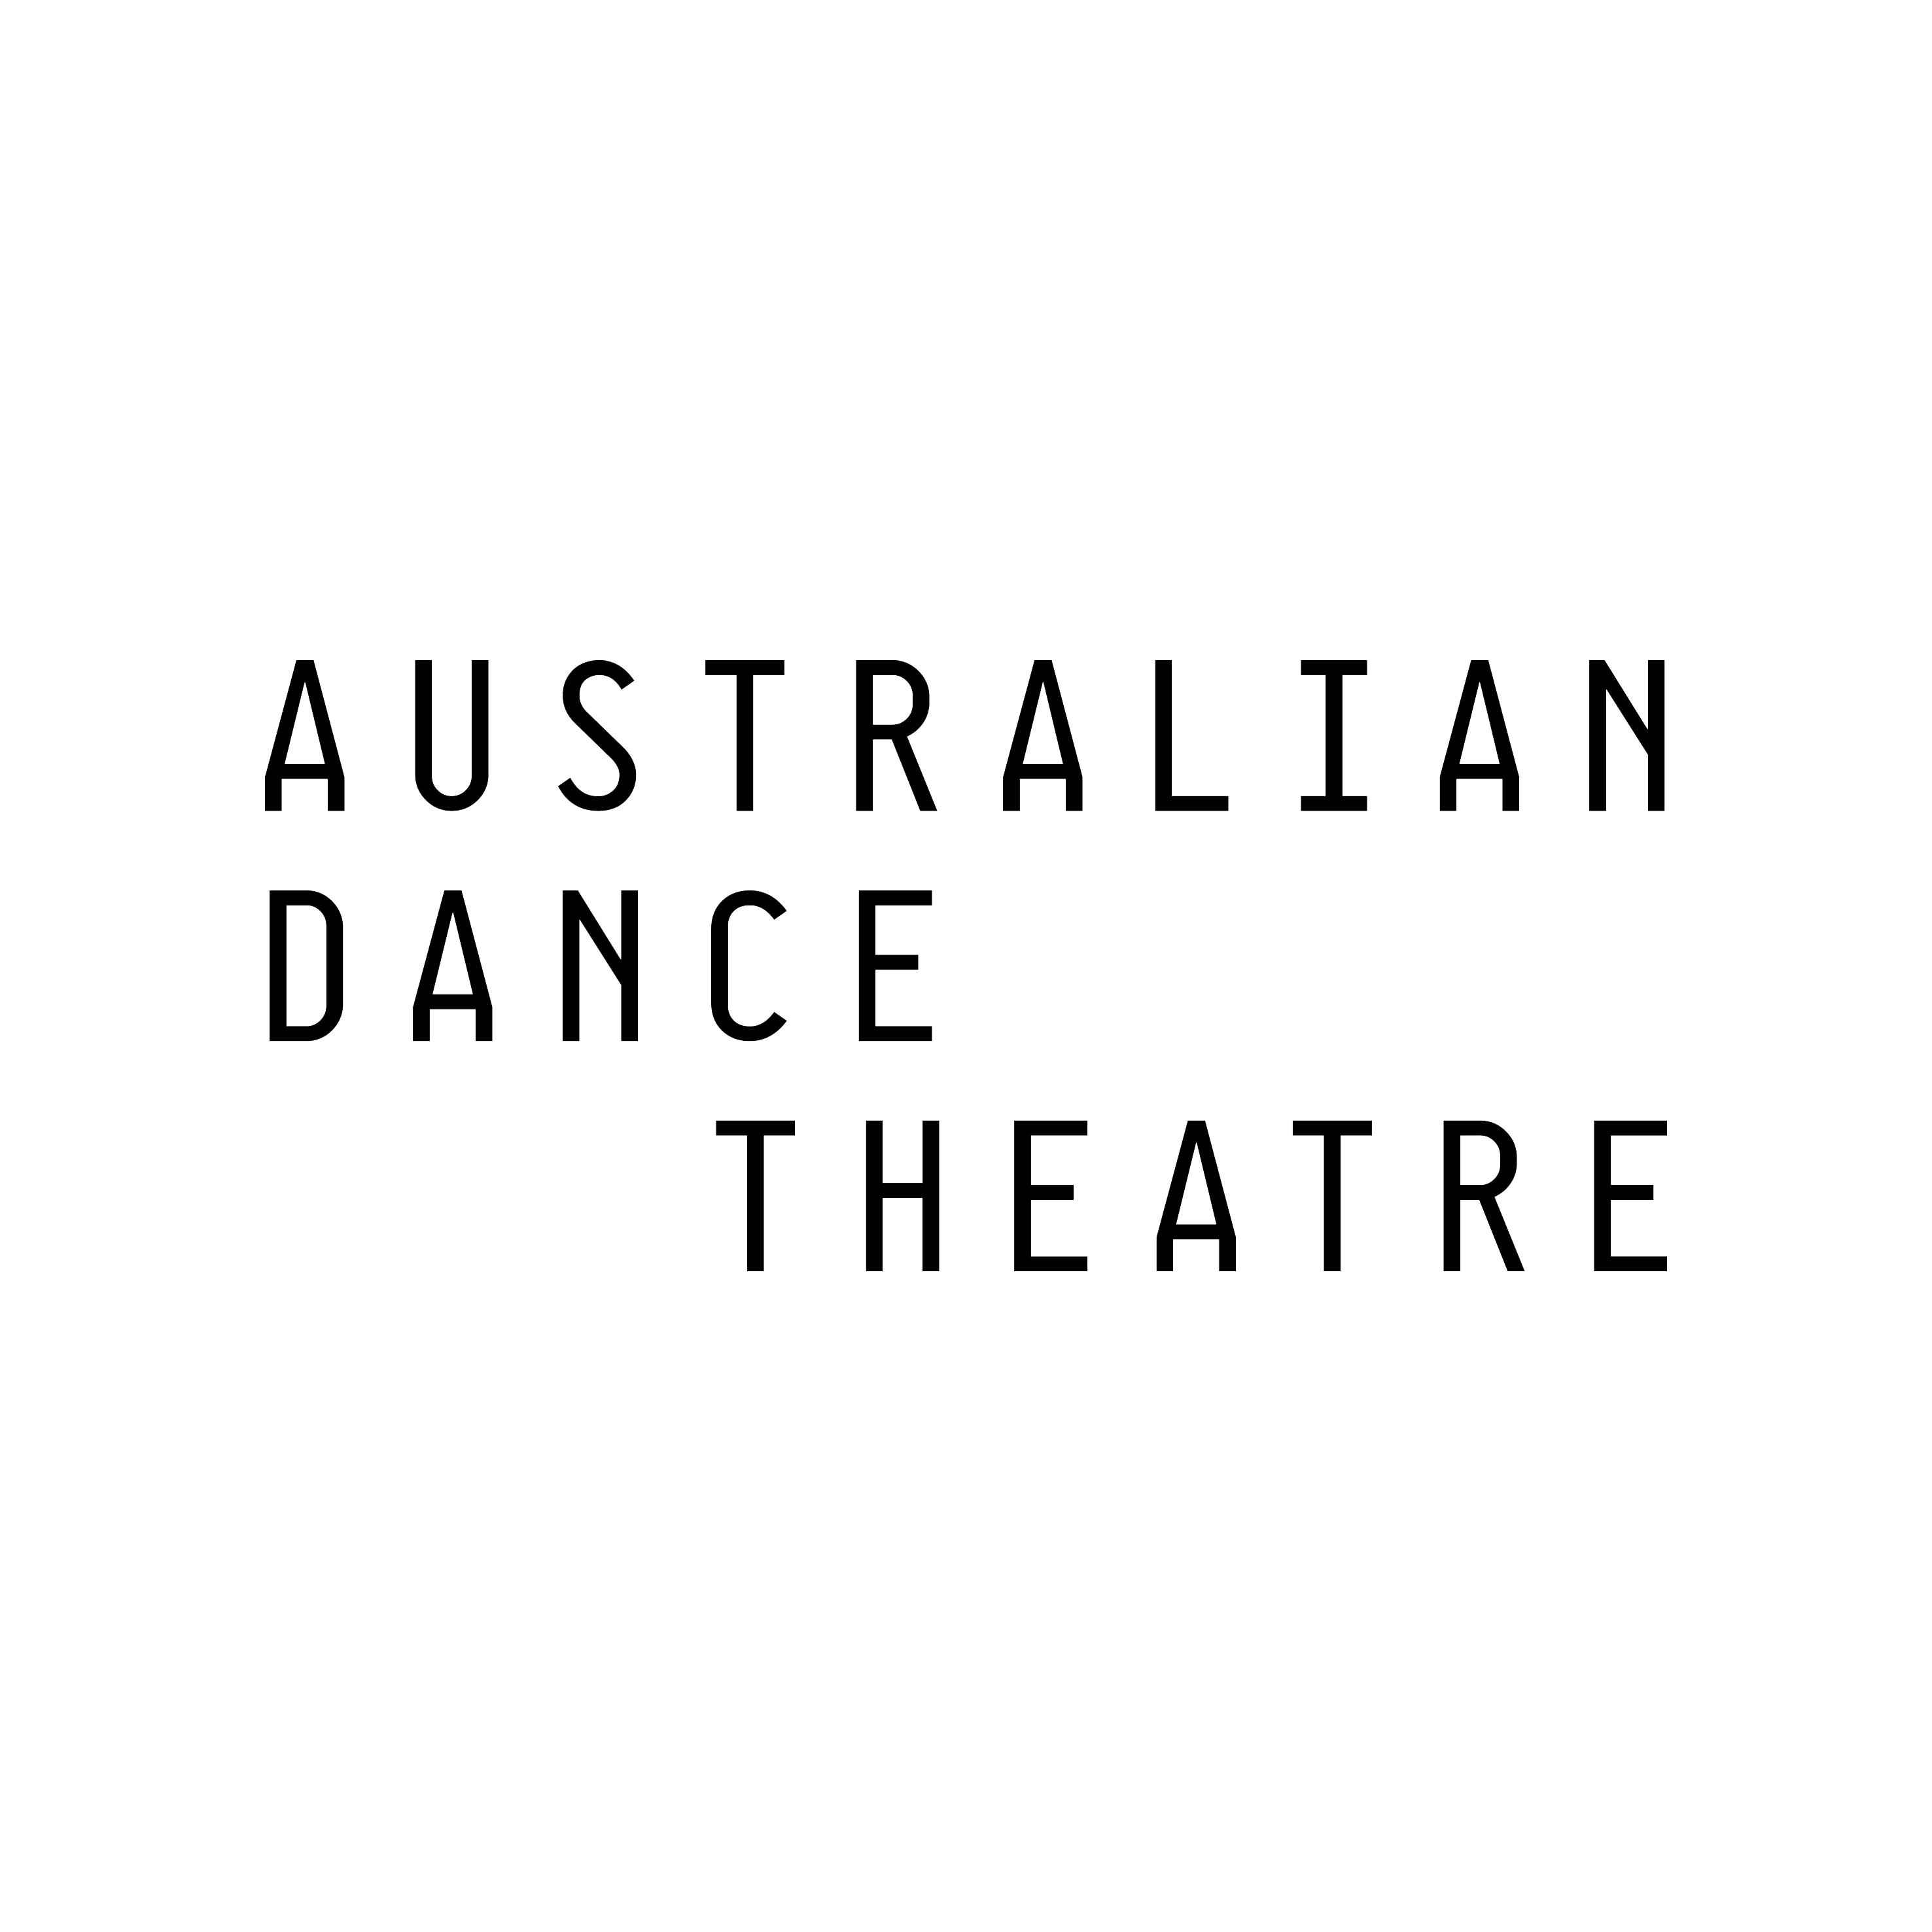 Australian Dance Theatre - Wikipedia